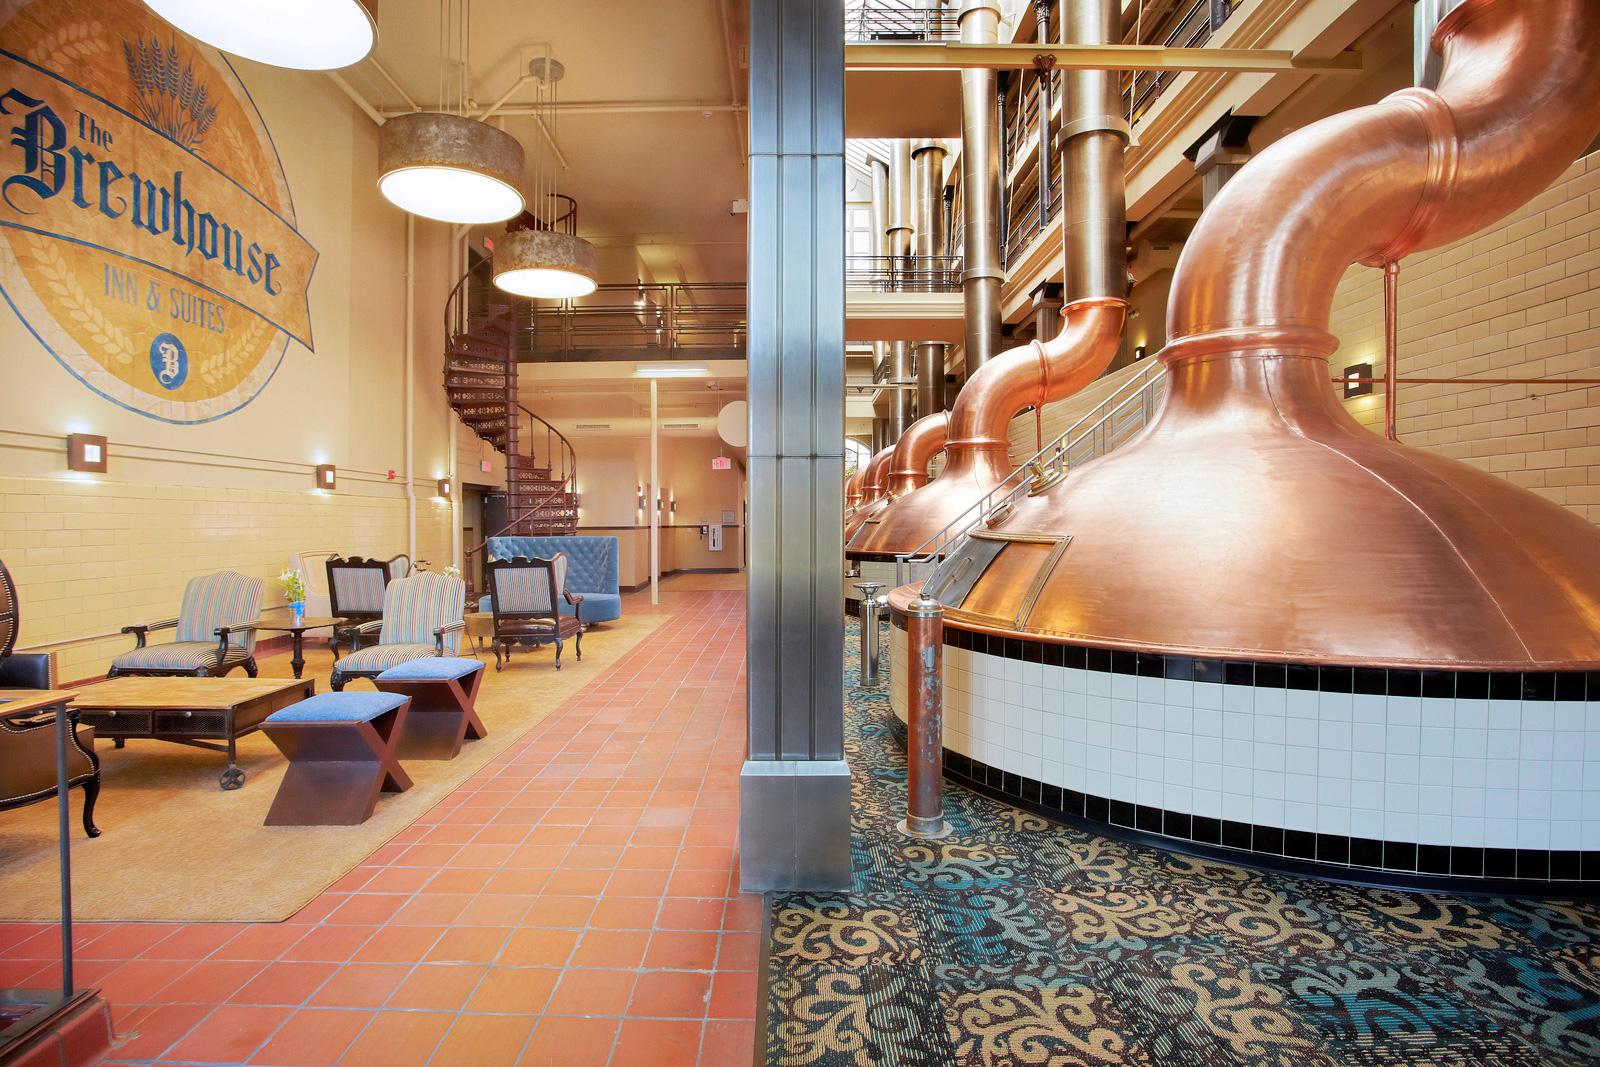 Brewhouse Inn. Photo courtesy of Visit Milwaukee.